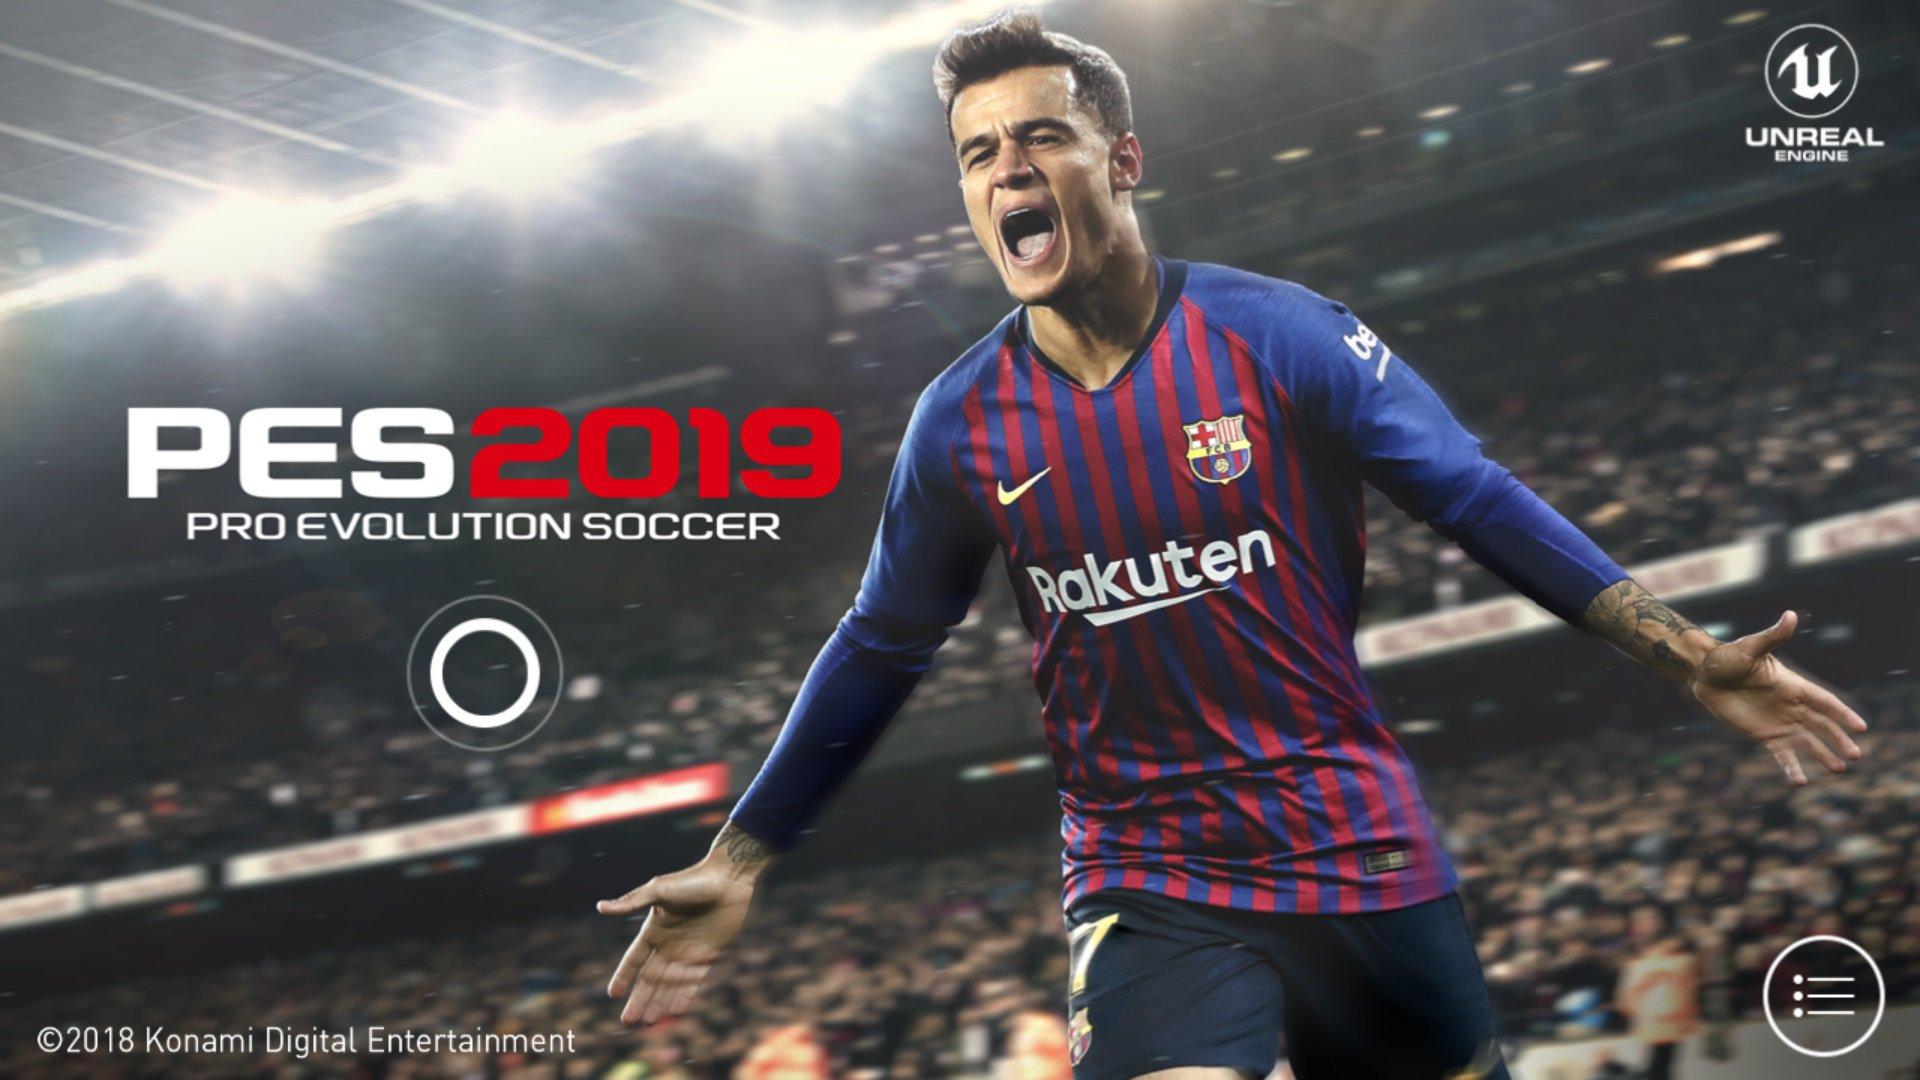 Pro Evolution Soccer 2019 PC Latest Version Game Free Download